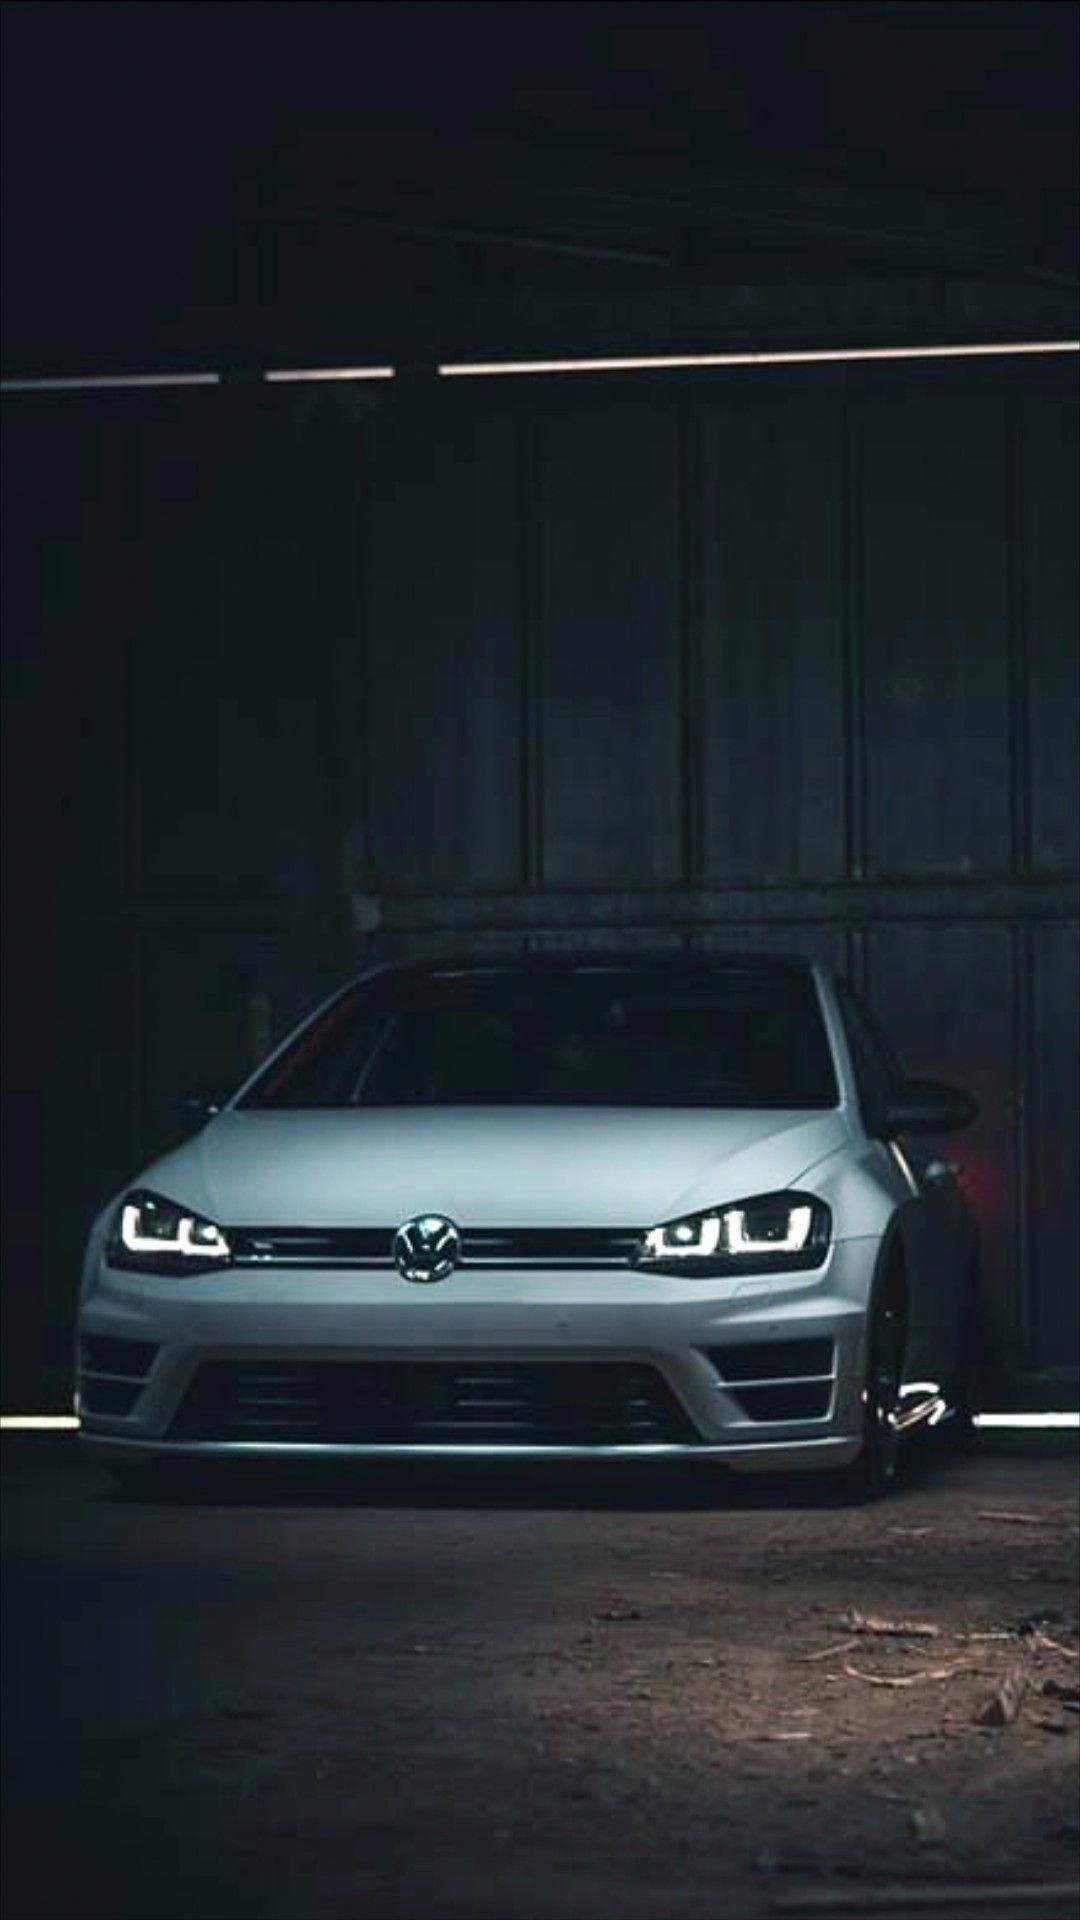 Customvwpologti Volkswagen Golf Vw Golf Wallpaper Volkswagen Polo Gti